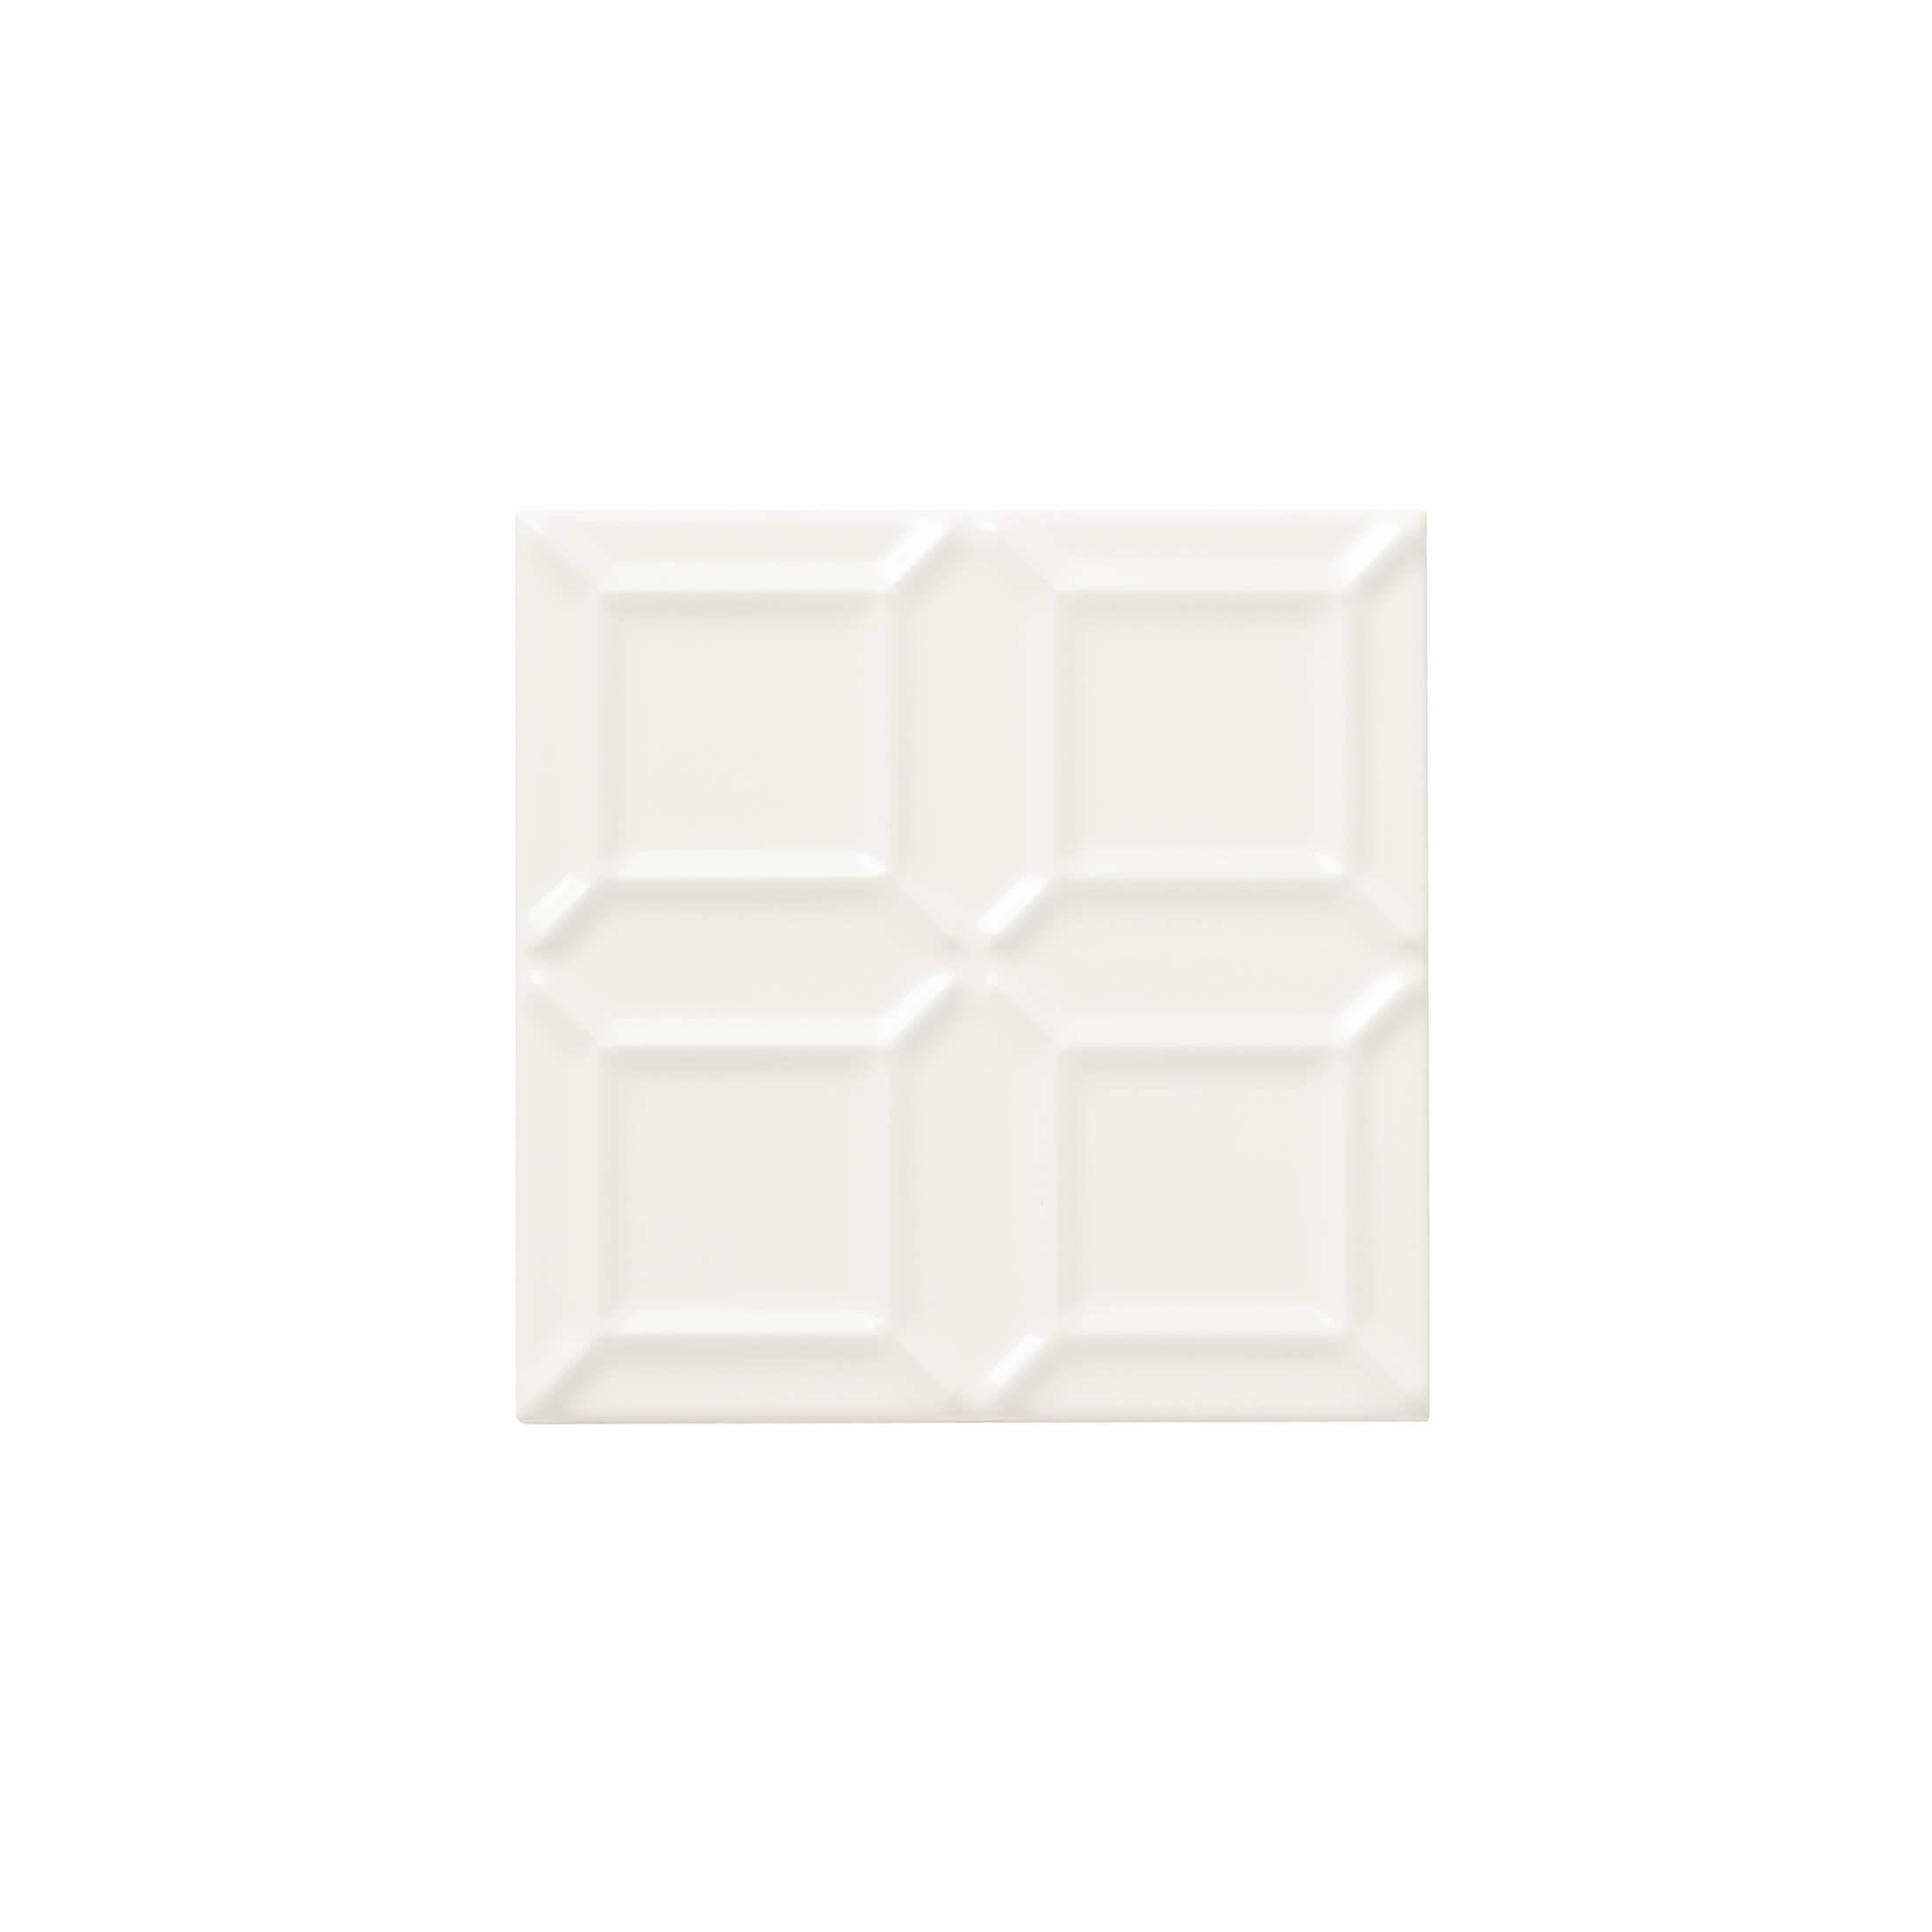 ADNE1110 - LISO EDGE - 15 cm X 15 cm